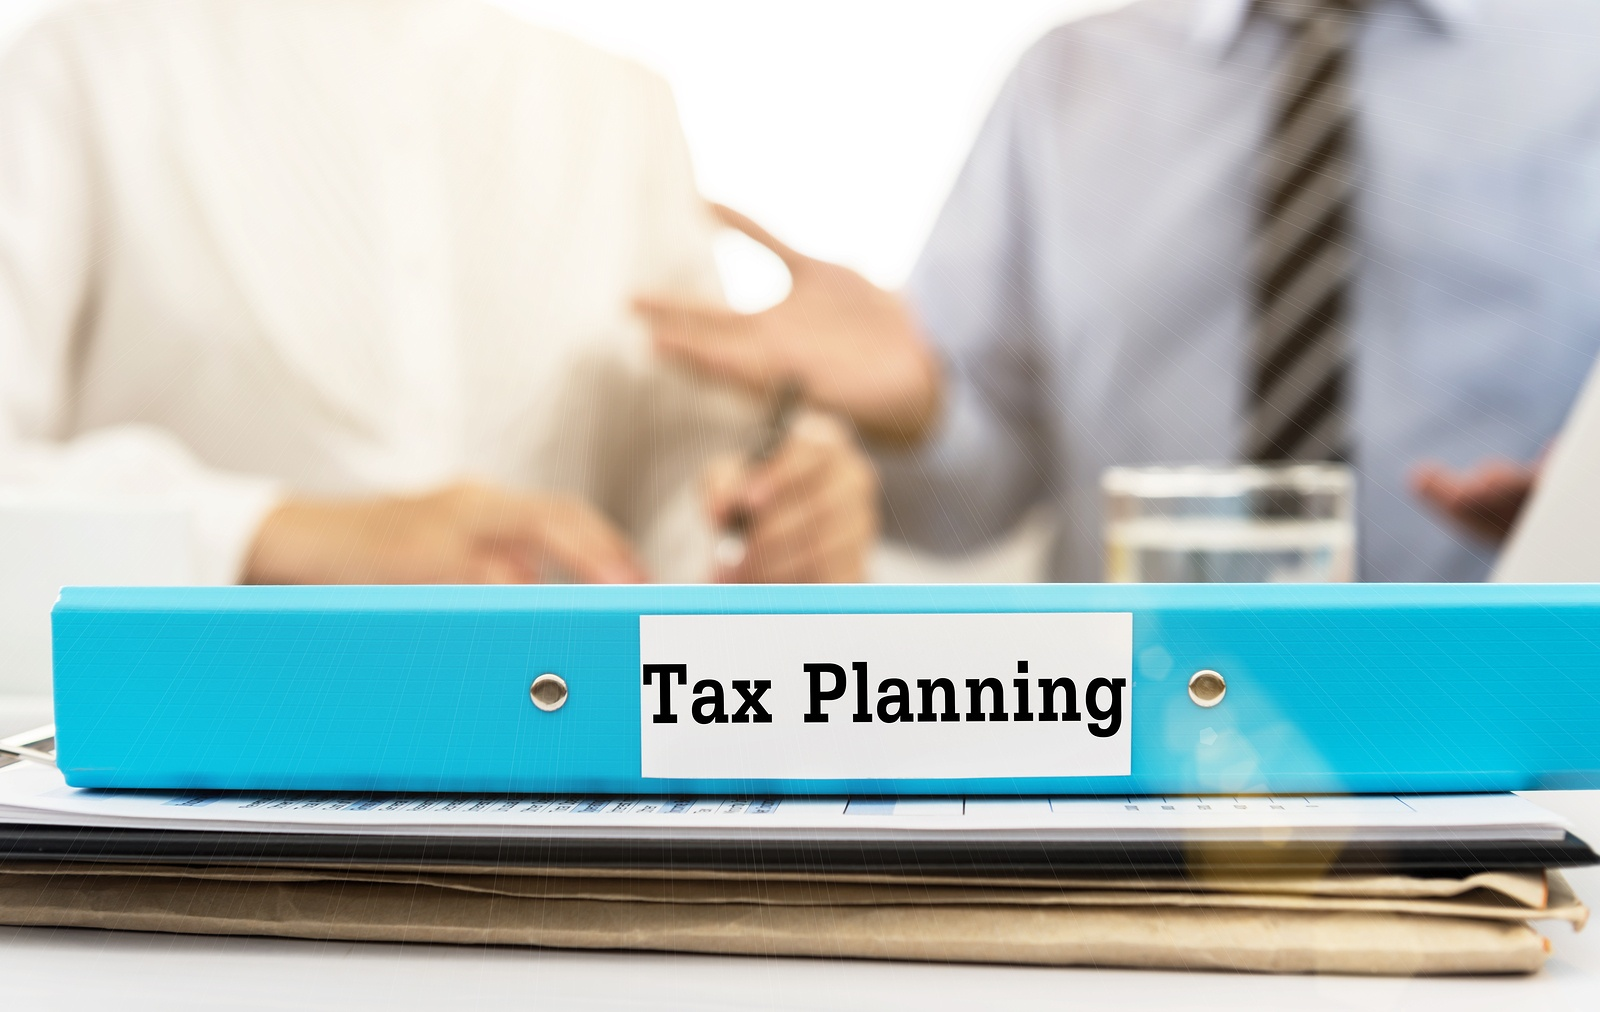 taxplanning2018.jpg